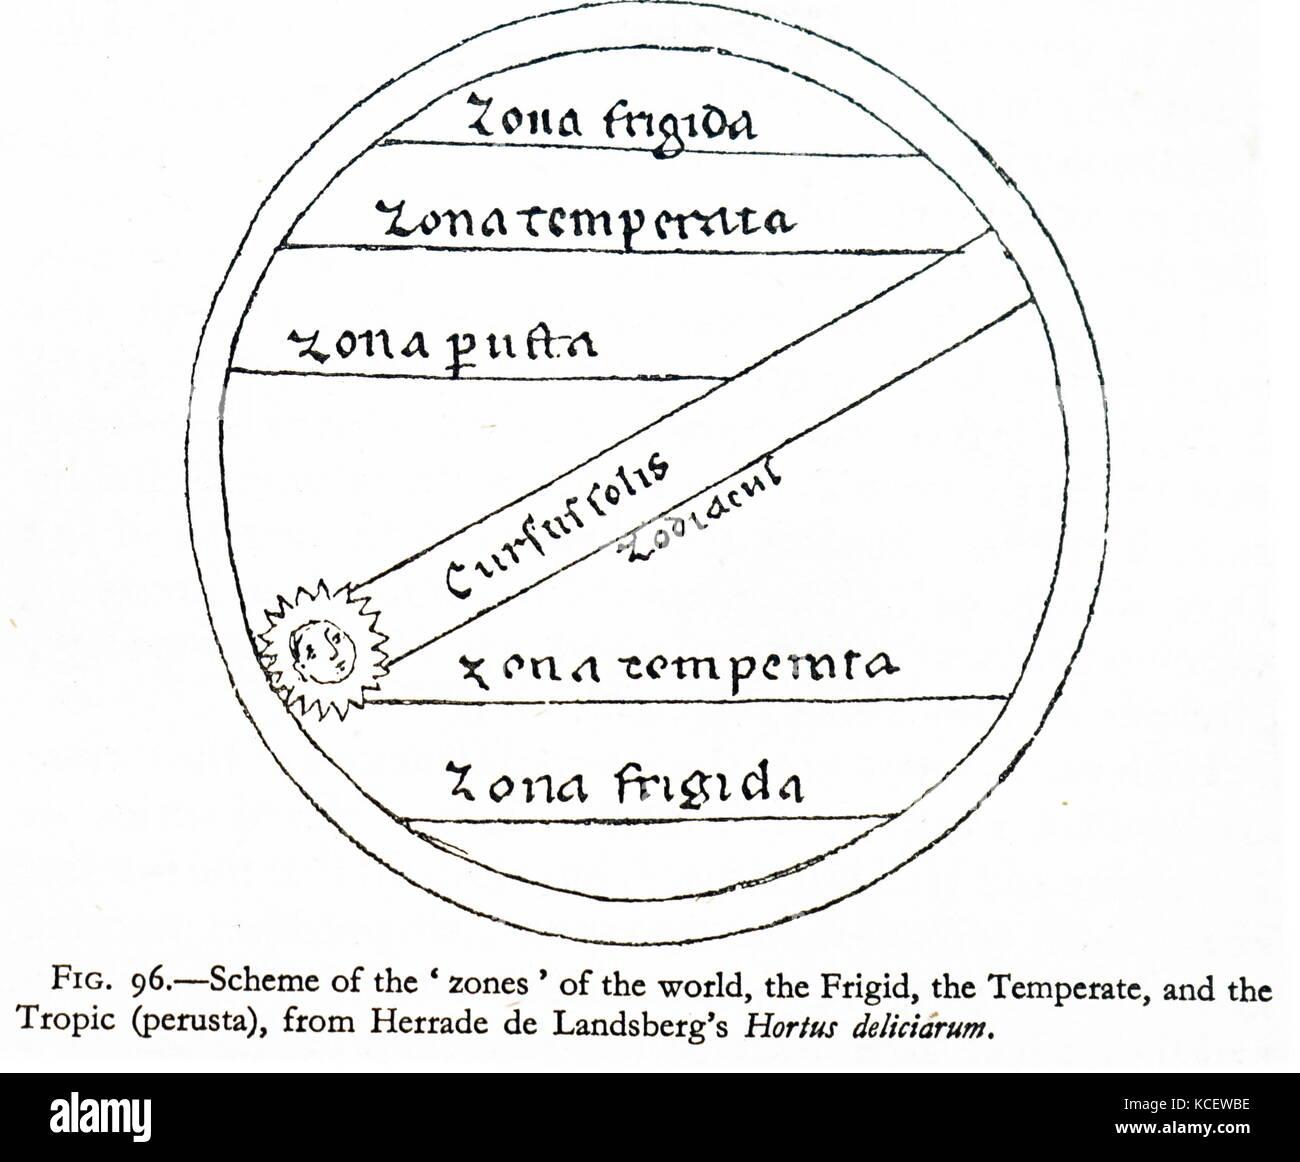 Medieval Manuscripts Stockfotos & Medieval Manuscripts Bilder - Alamy